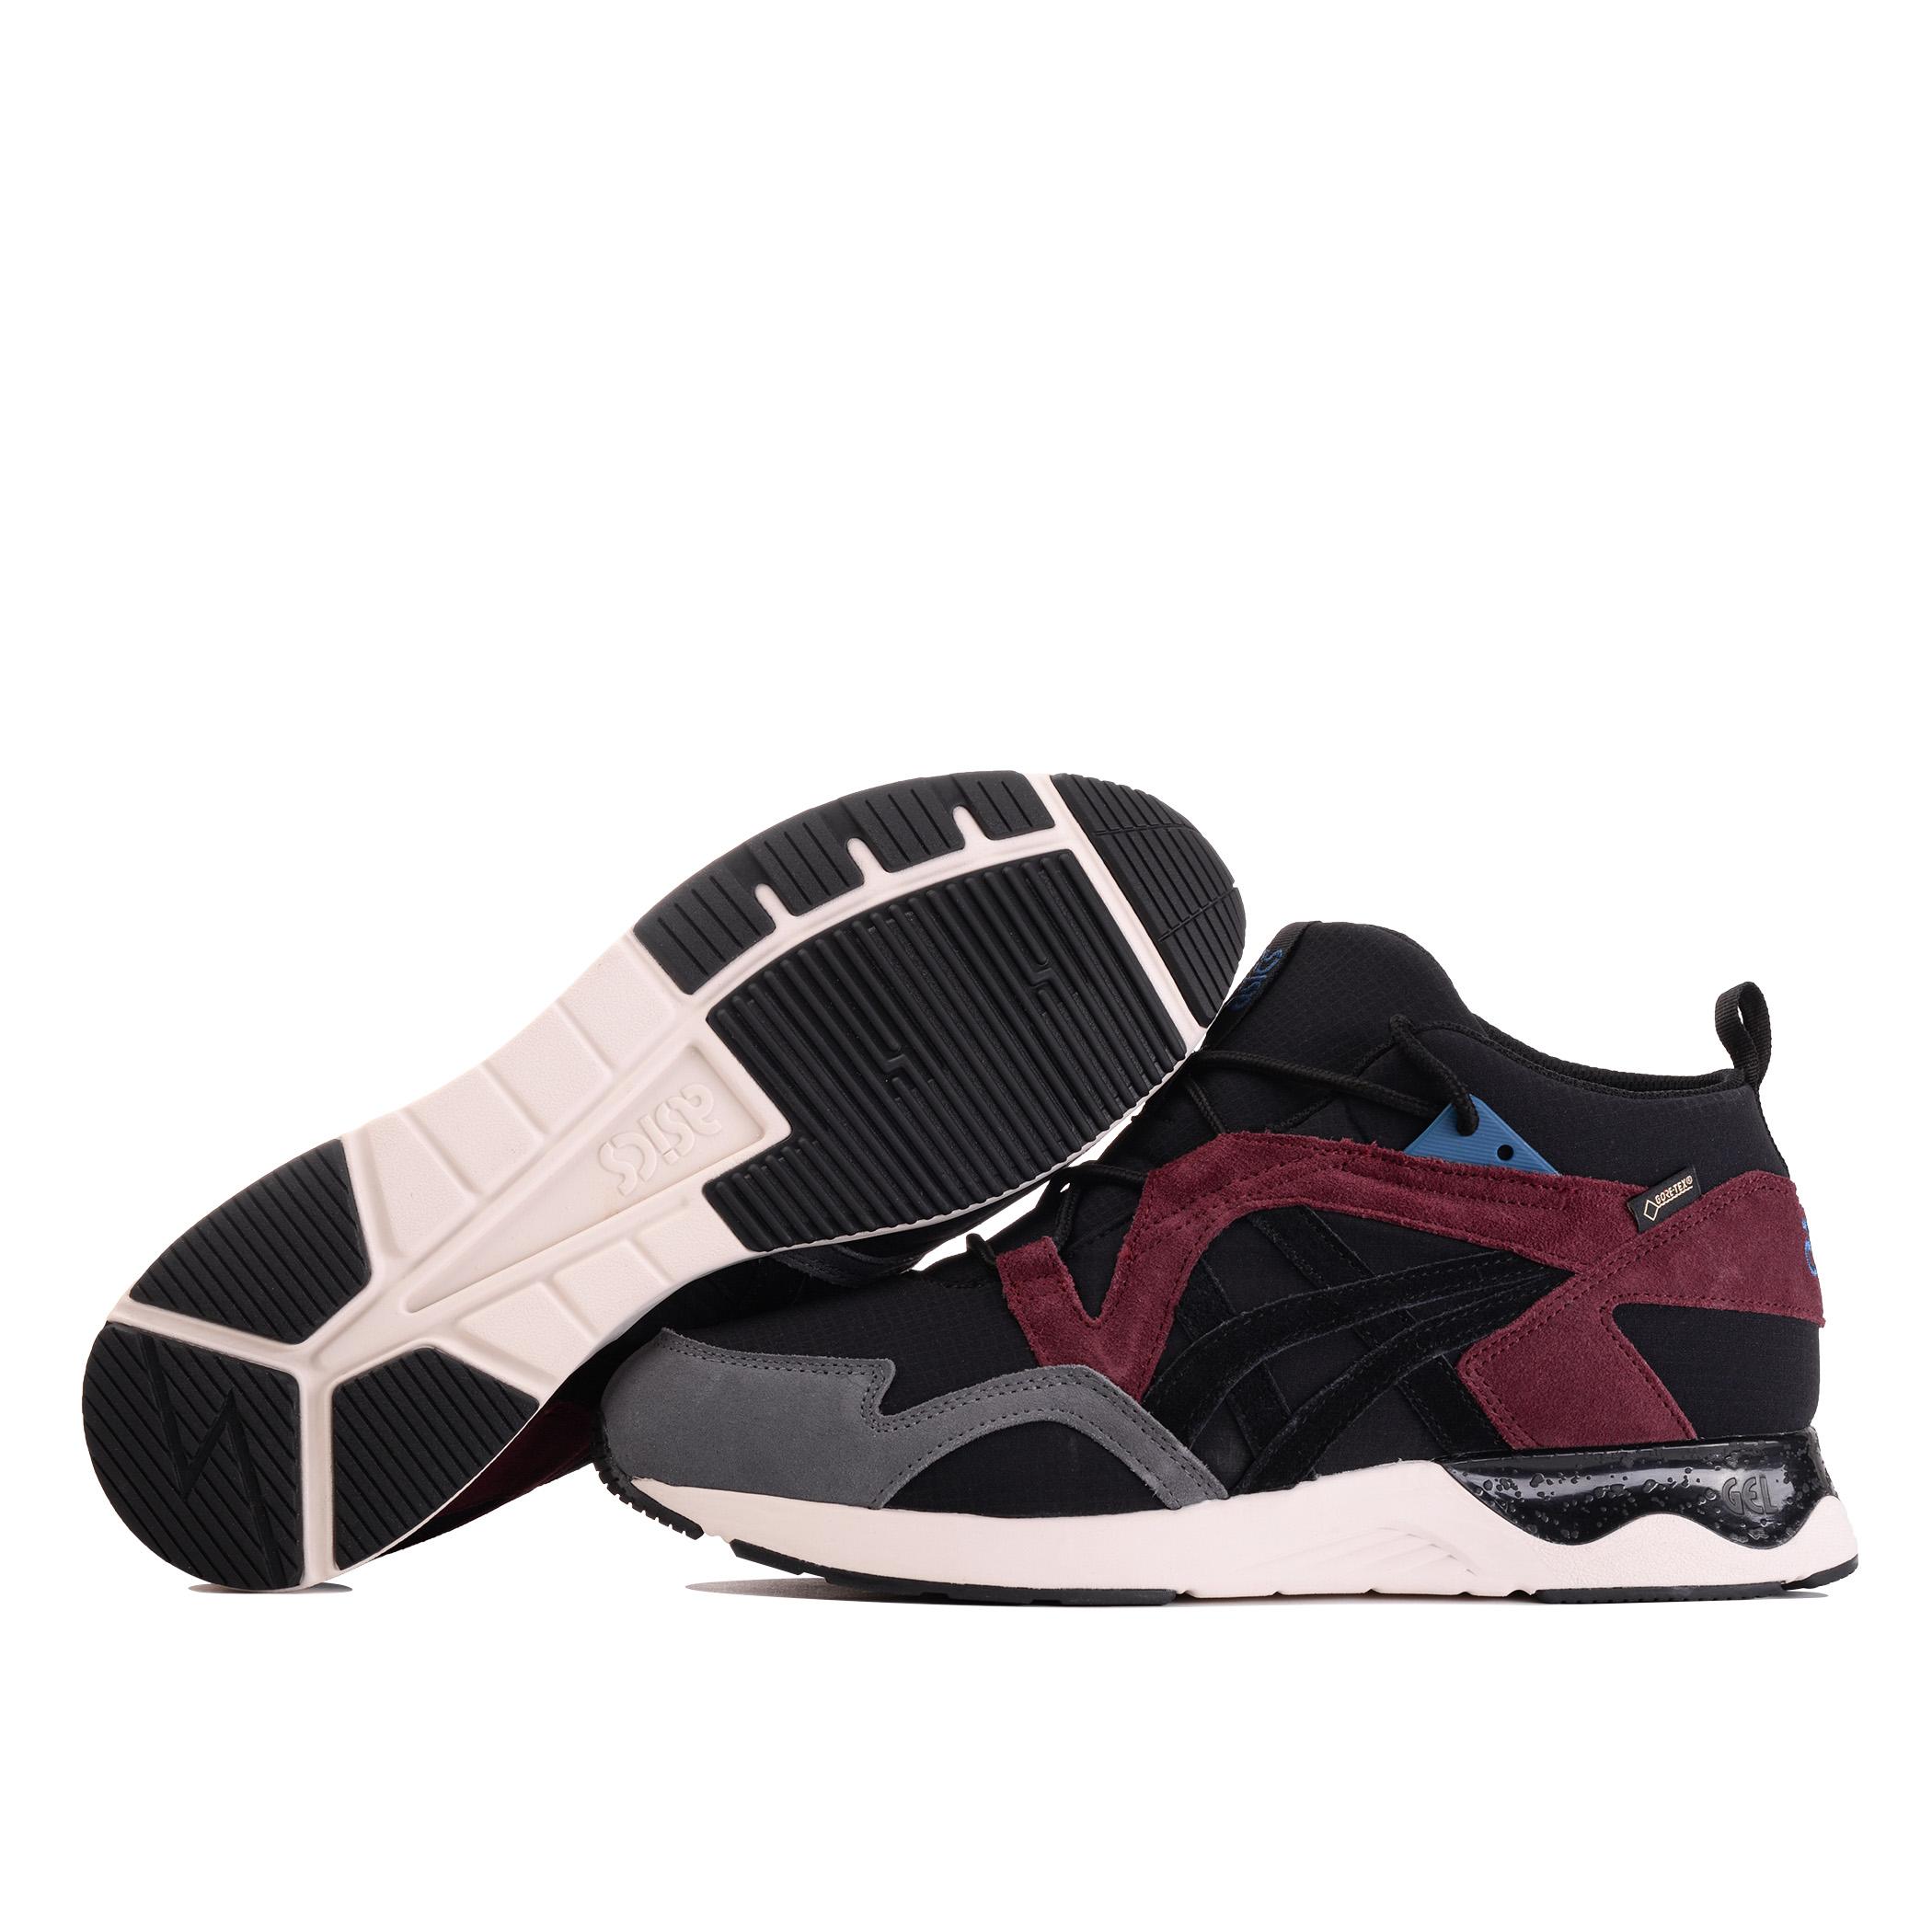 11dd0f09 Мужские кроссовки ASICS Tiger Gel Lyte V Sanze MT Gore-Tex Black - фото 5